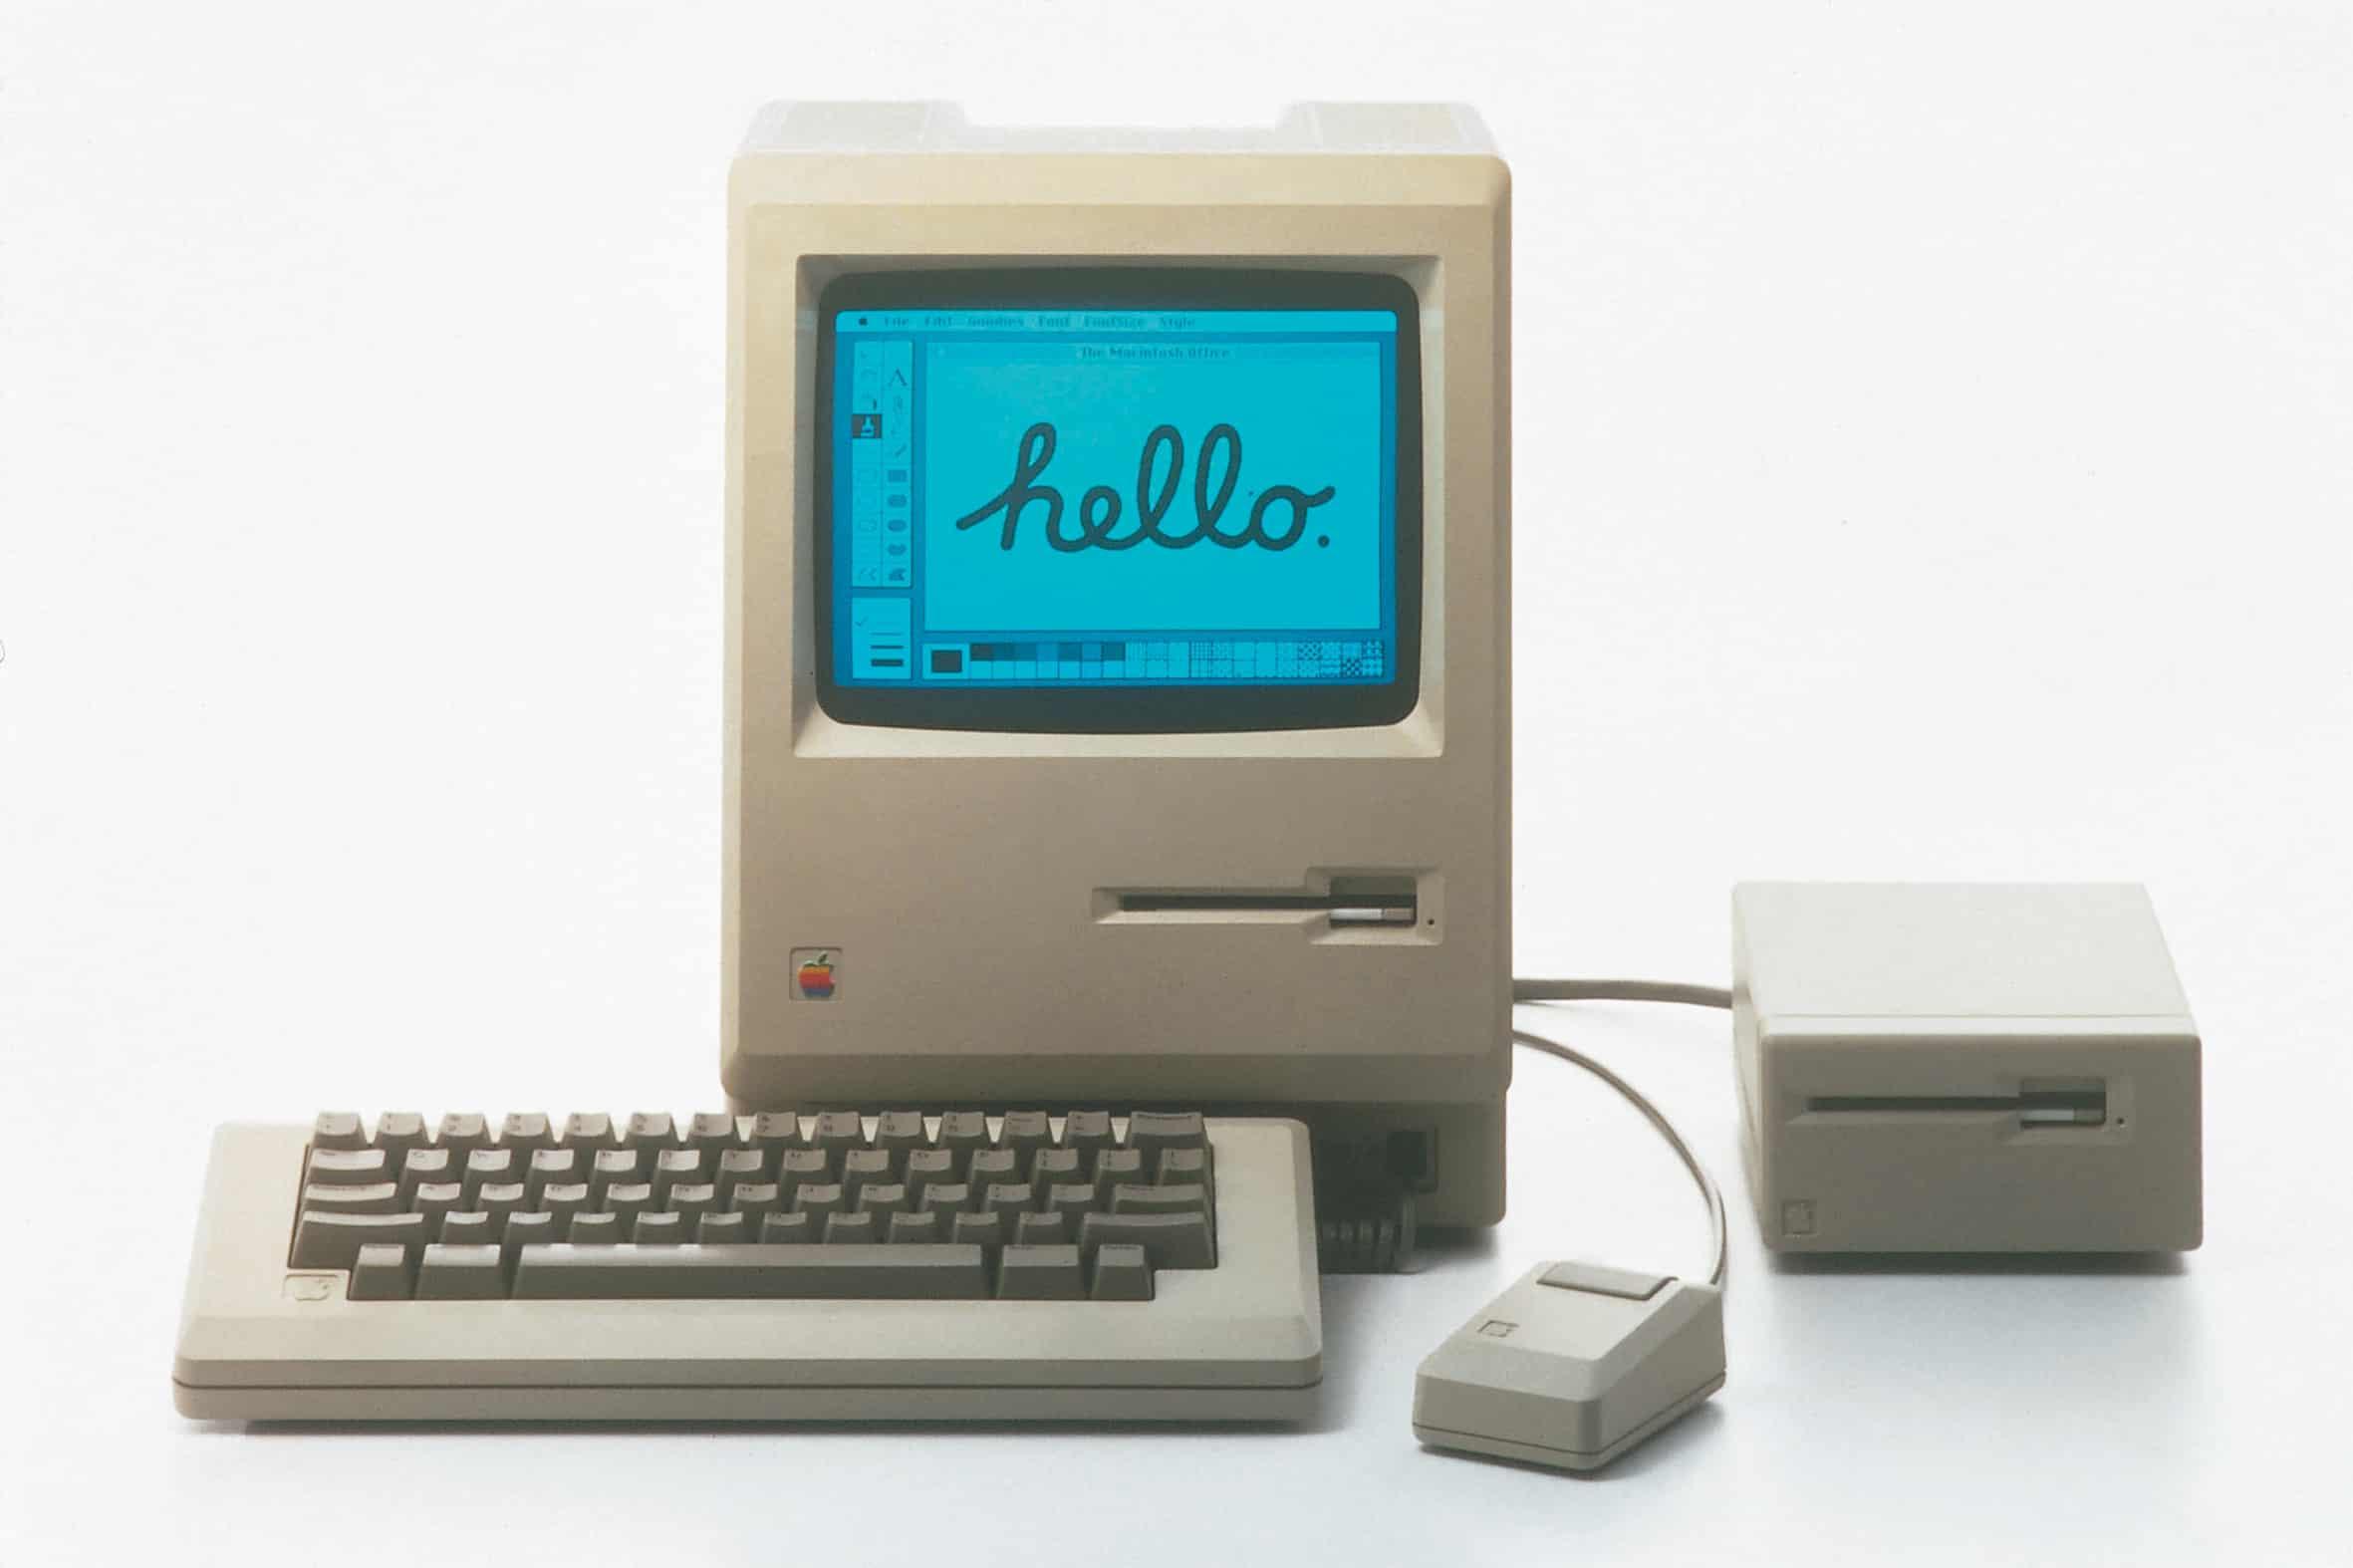 4.0.1 » Mac History